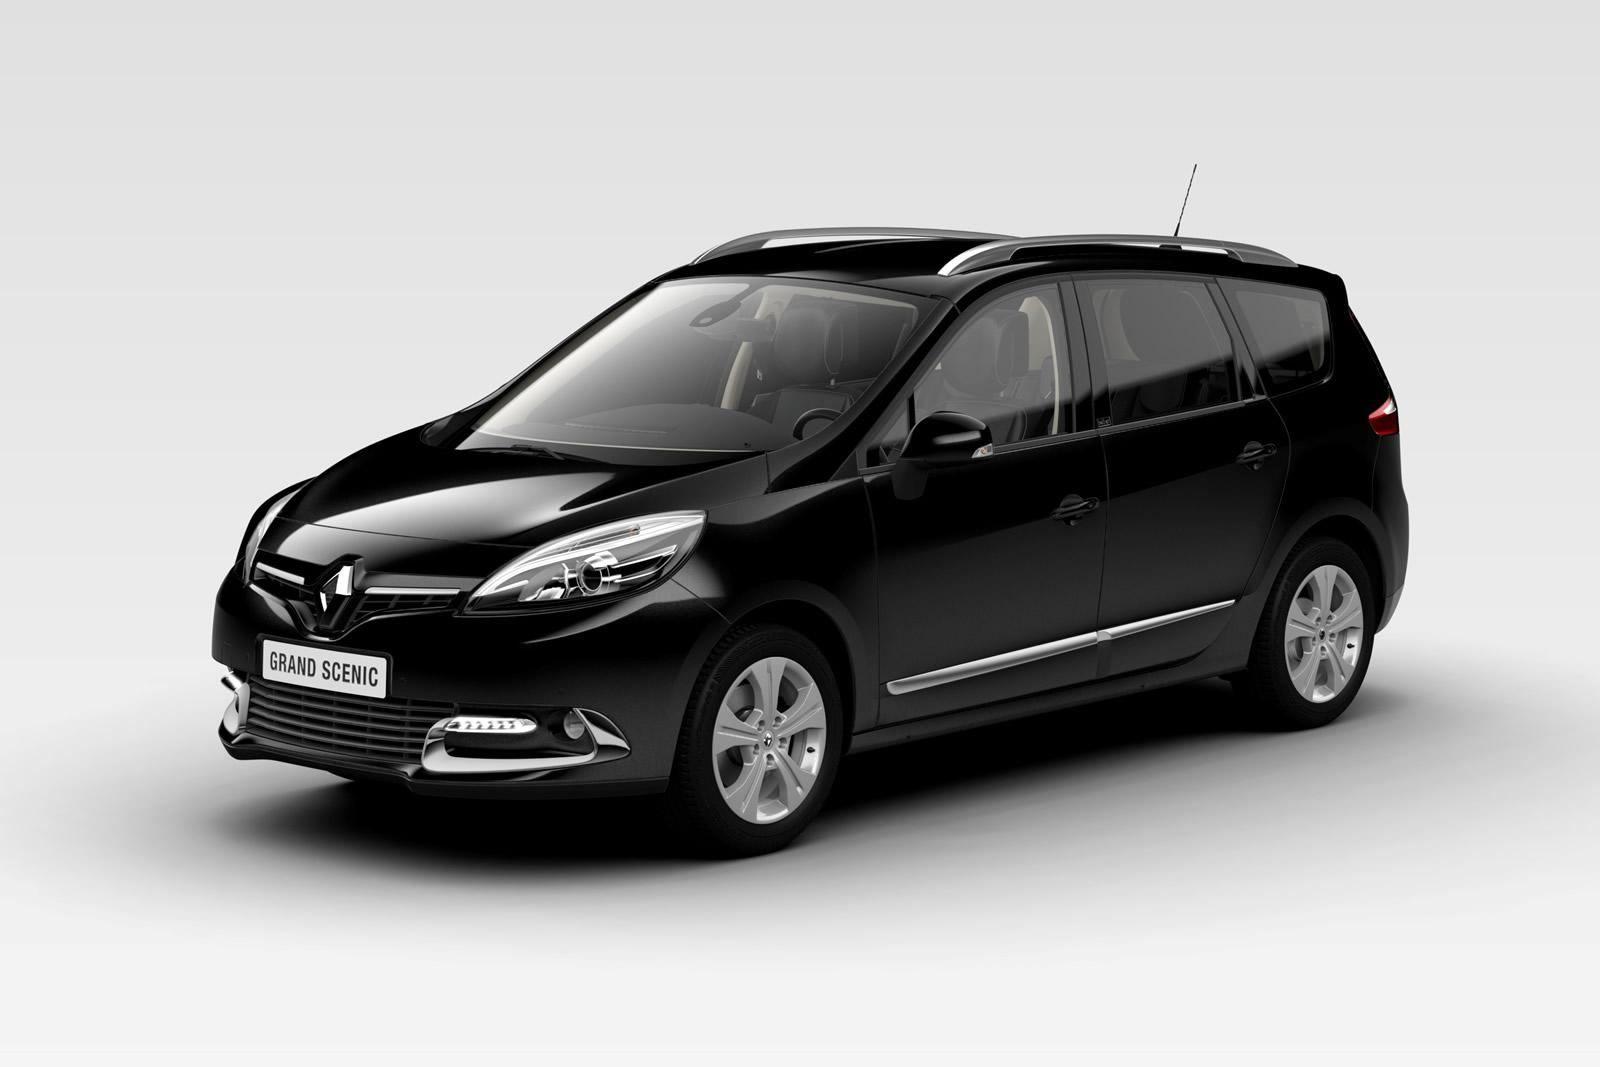 Renault Grand Scenic Black Renault Grand Scenic 2014 Black